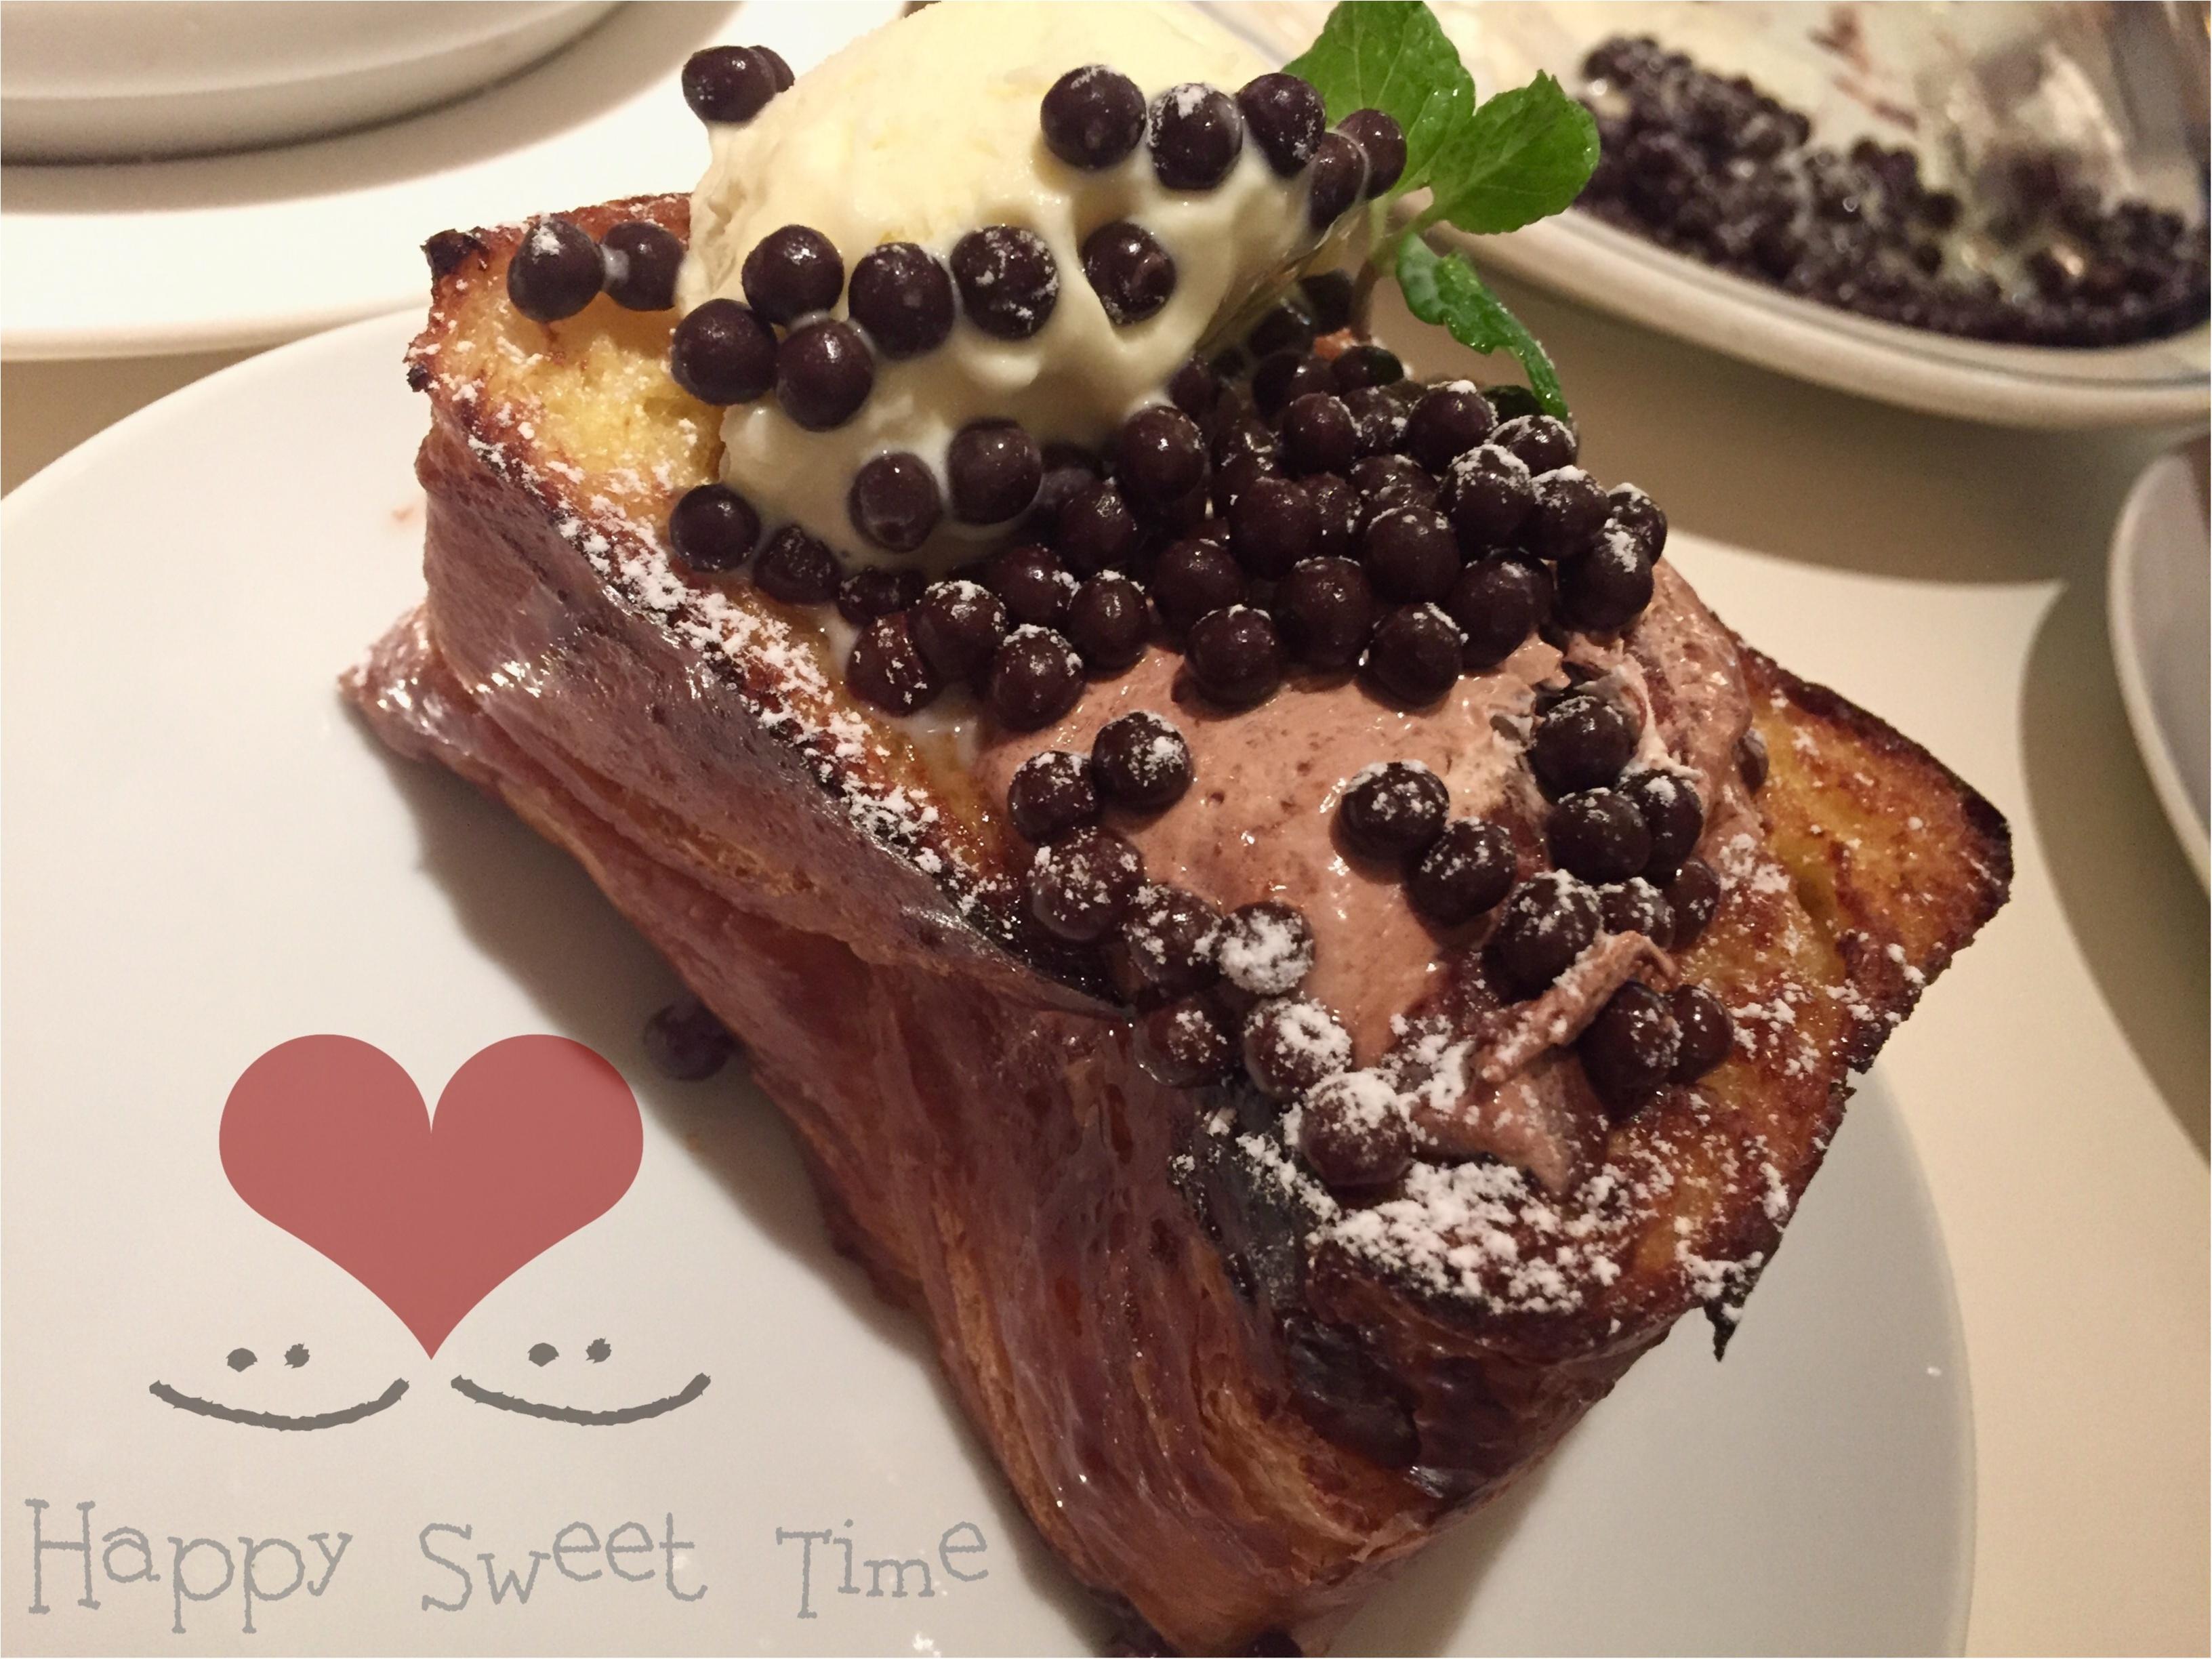 【FOOD】1000円以下でいいんですか?!絶品♥︎WIRED CAFEのフレンチトースト_4